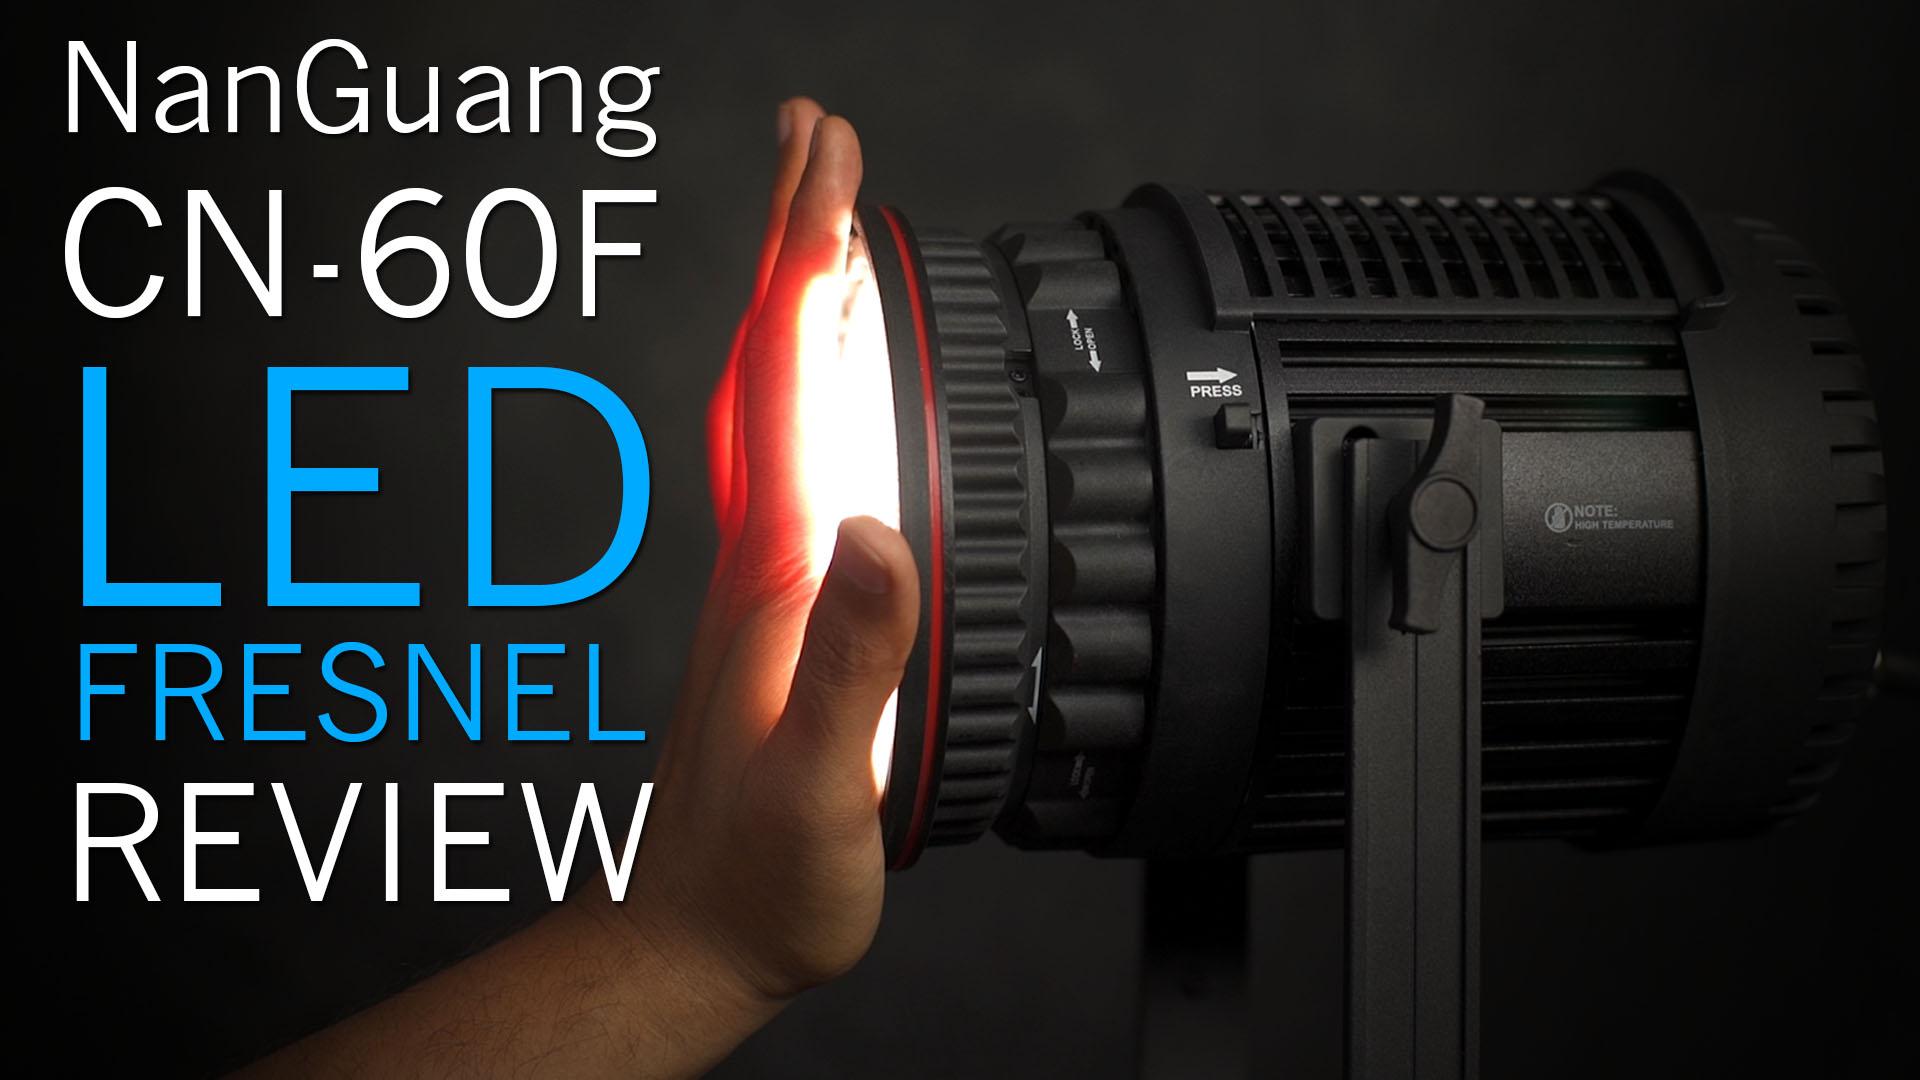 NanGuang CN-60F LED Fresnel Review